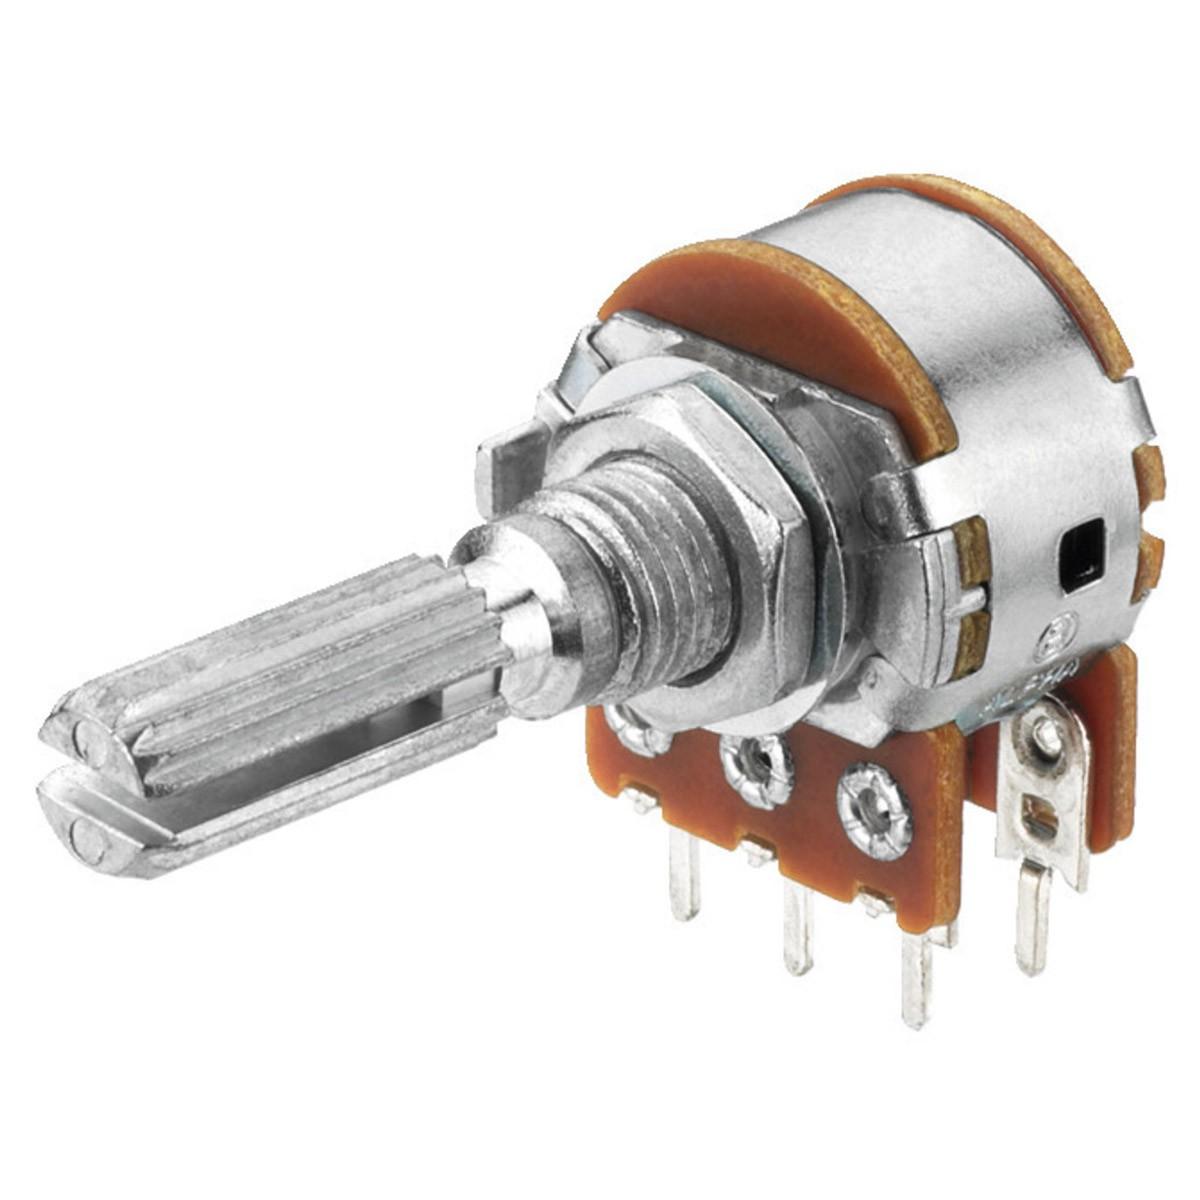 Stereo potentiometer VRA-100S50 50kohm